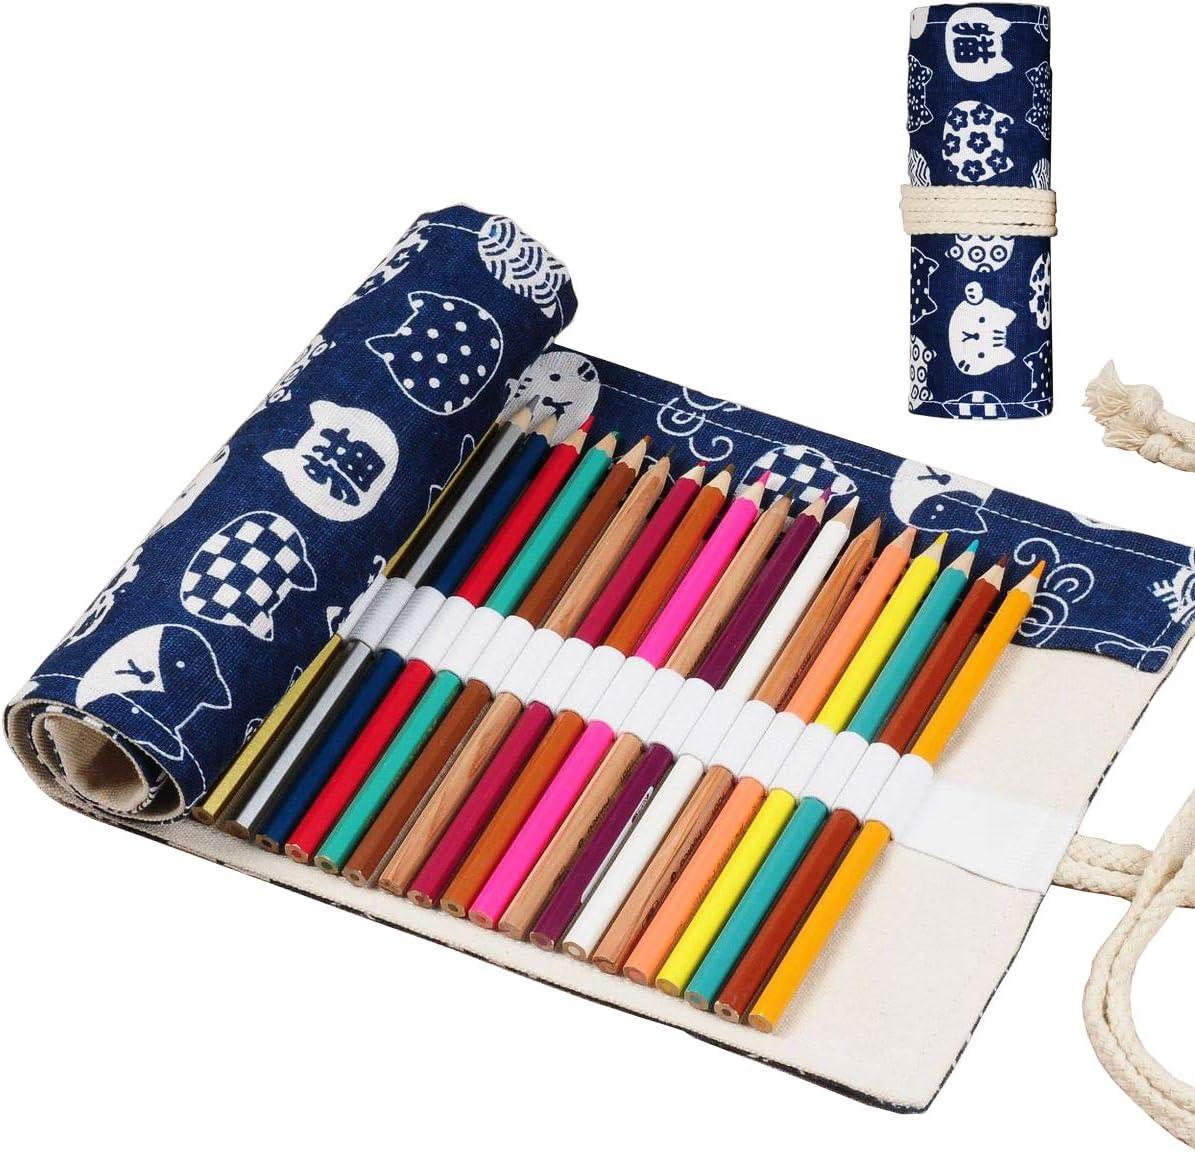 Enyuwlcm Daily bargain Nashville-Davidson Mall sale Canvas Stationery Handmade Roll Up for Pencil Arti Case